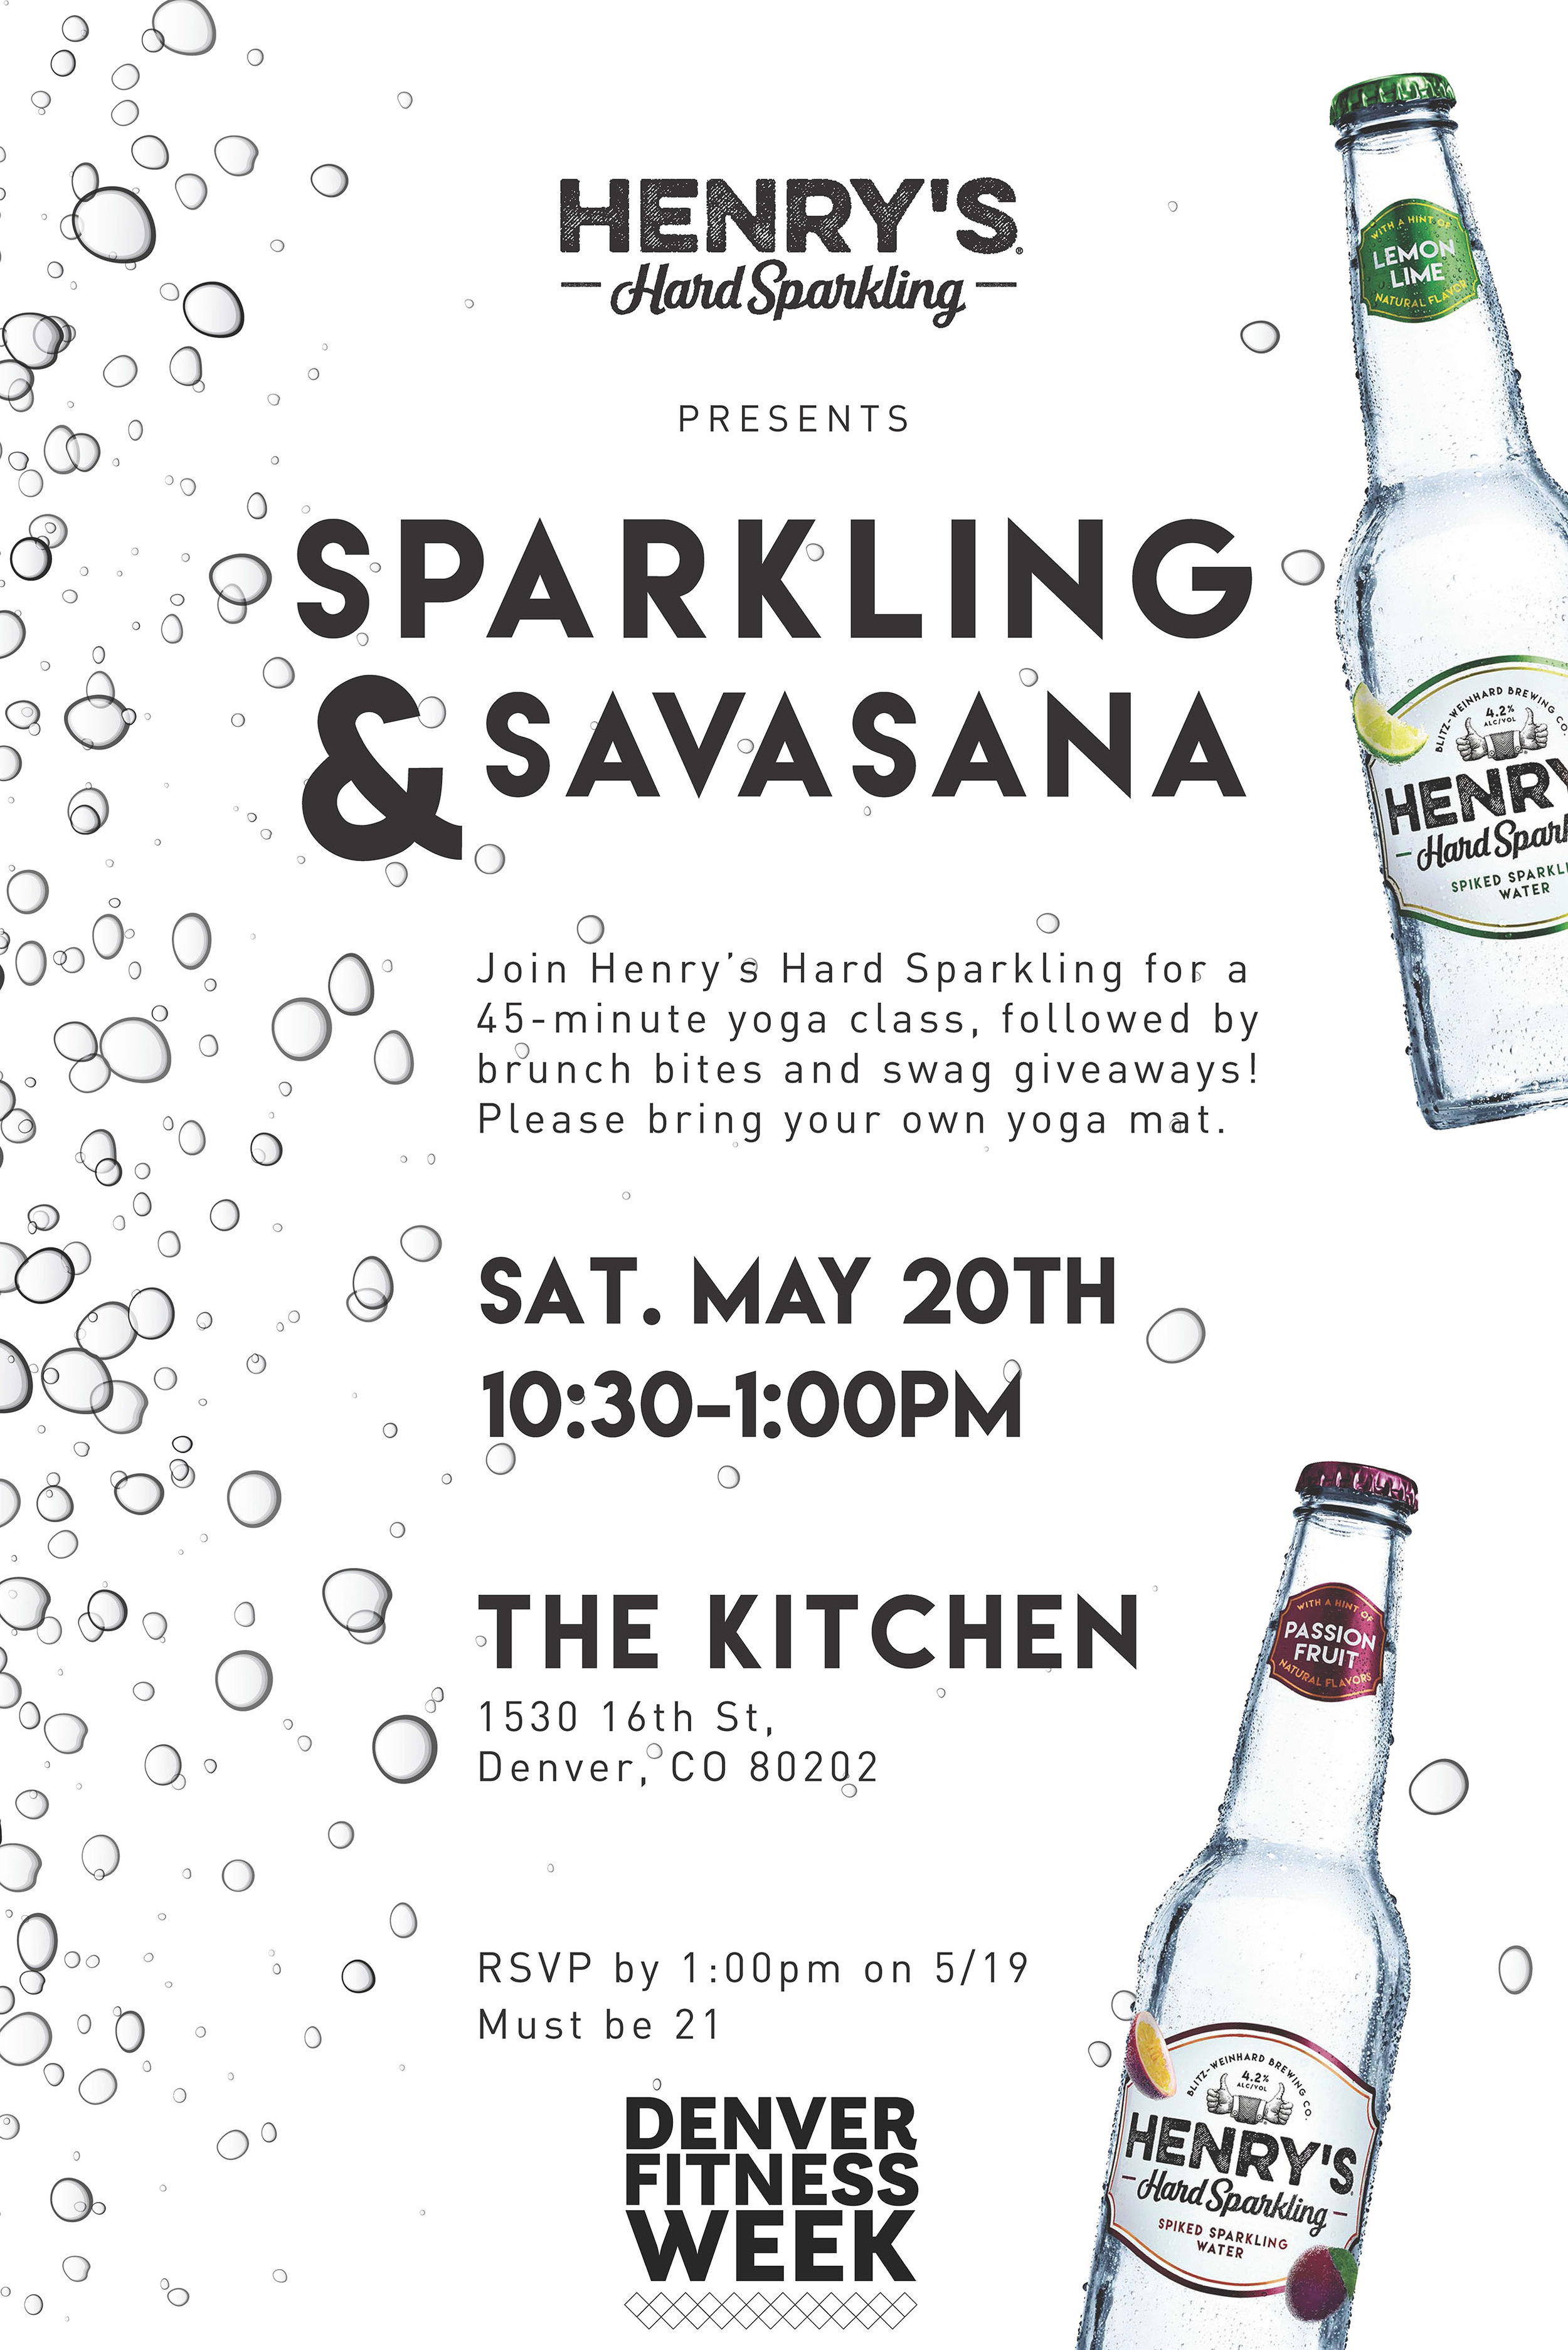 SparklingSavasana_Denver_Invite.jpg